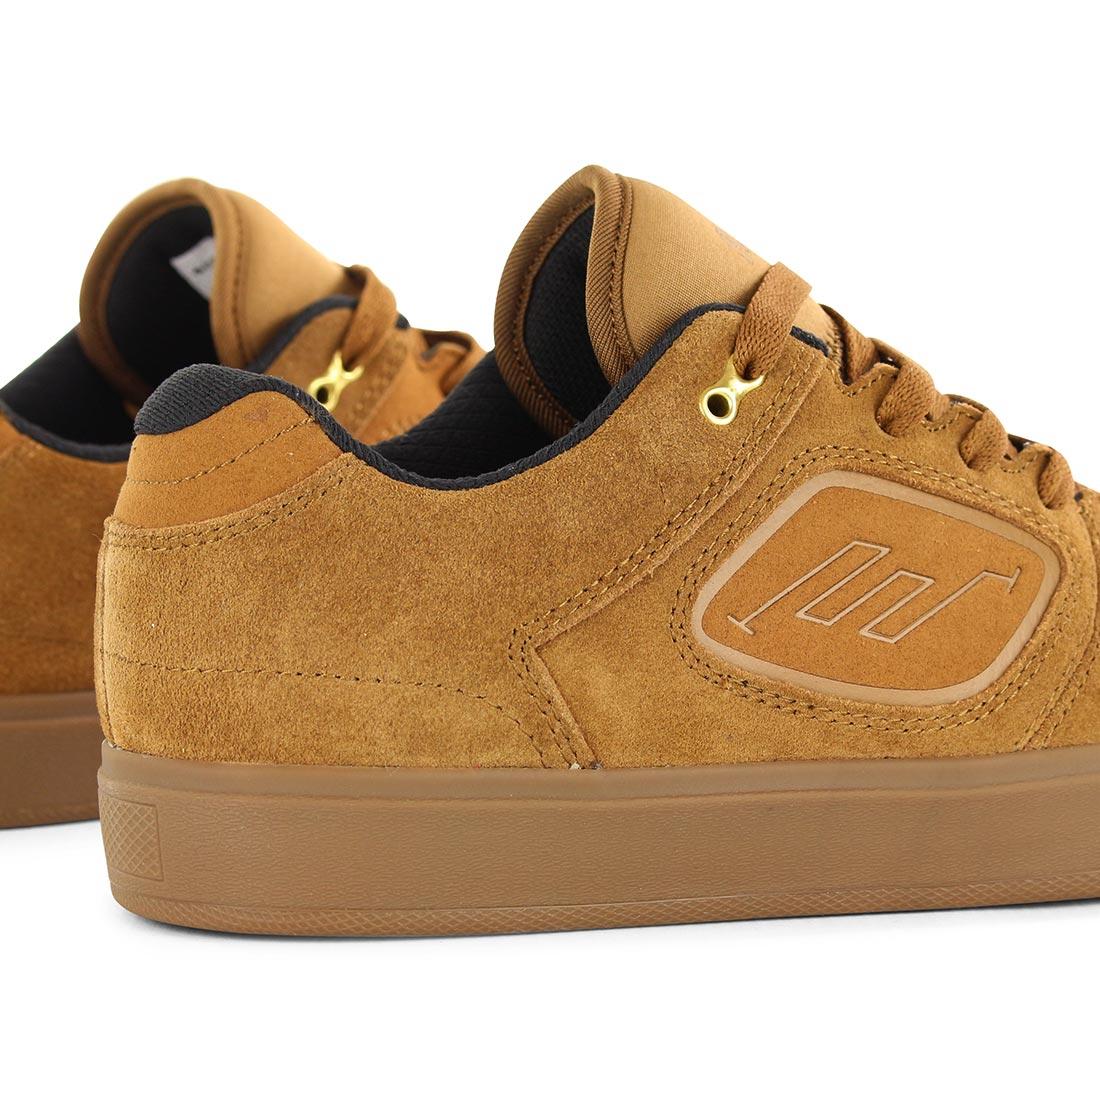 73f60e8bf3aca9 Emerica-Shoes-Reynolds-G6-Brown-Gum-06